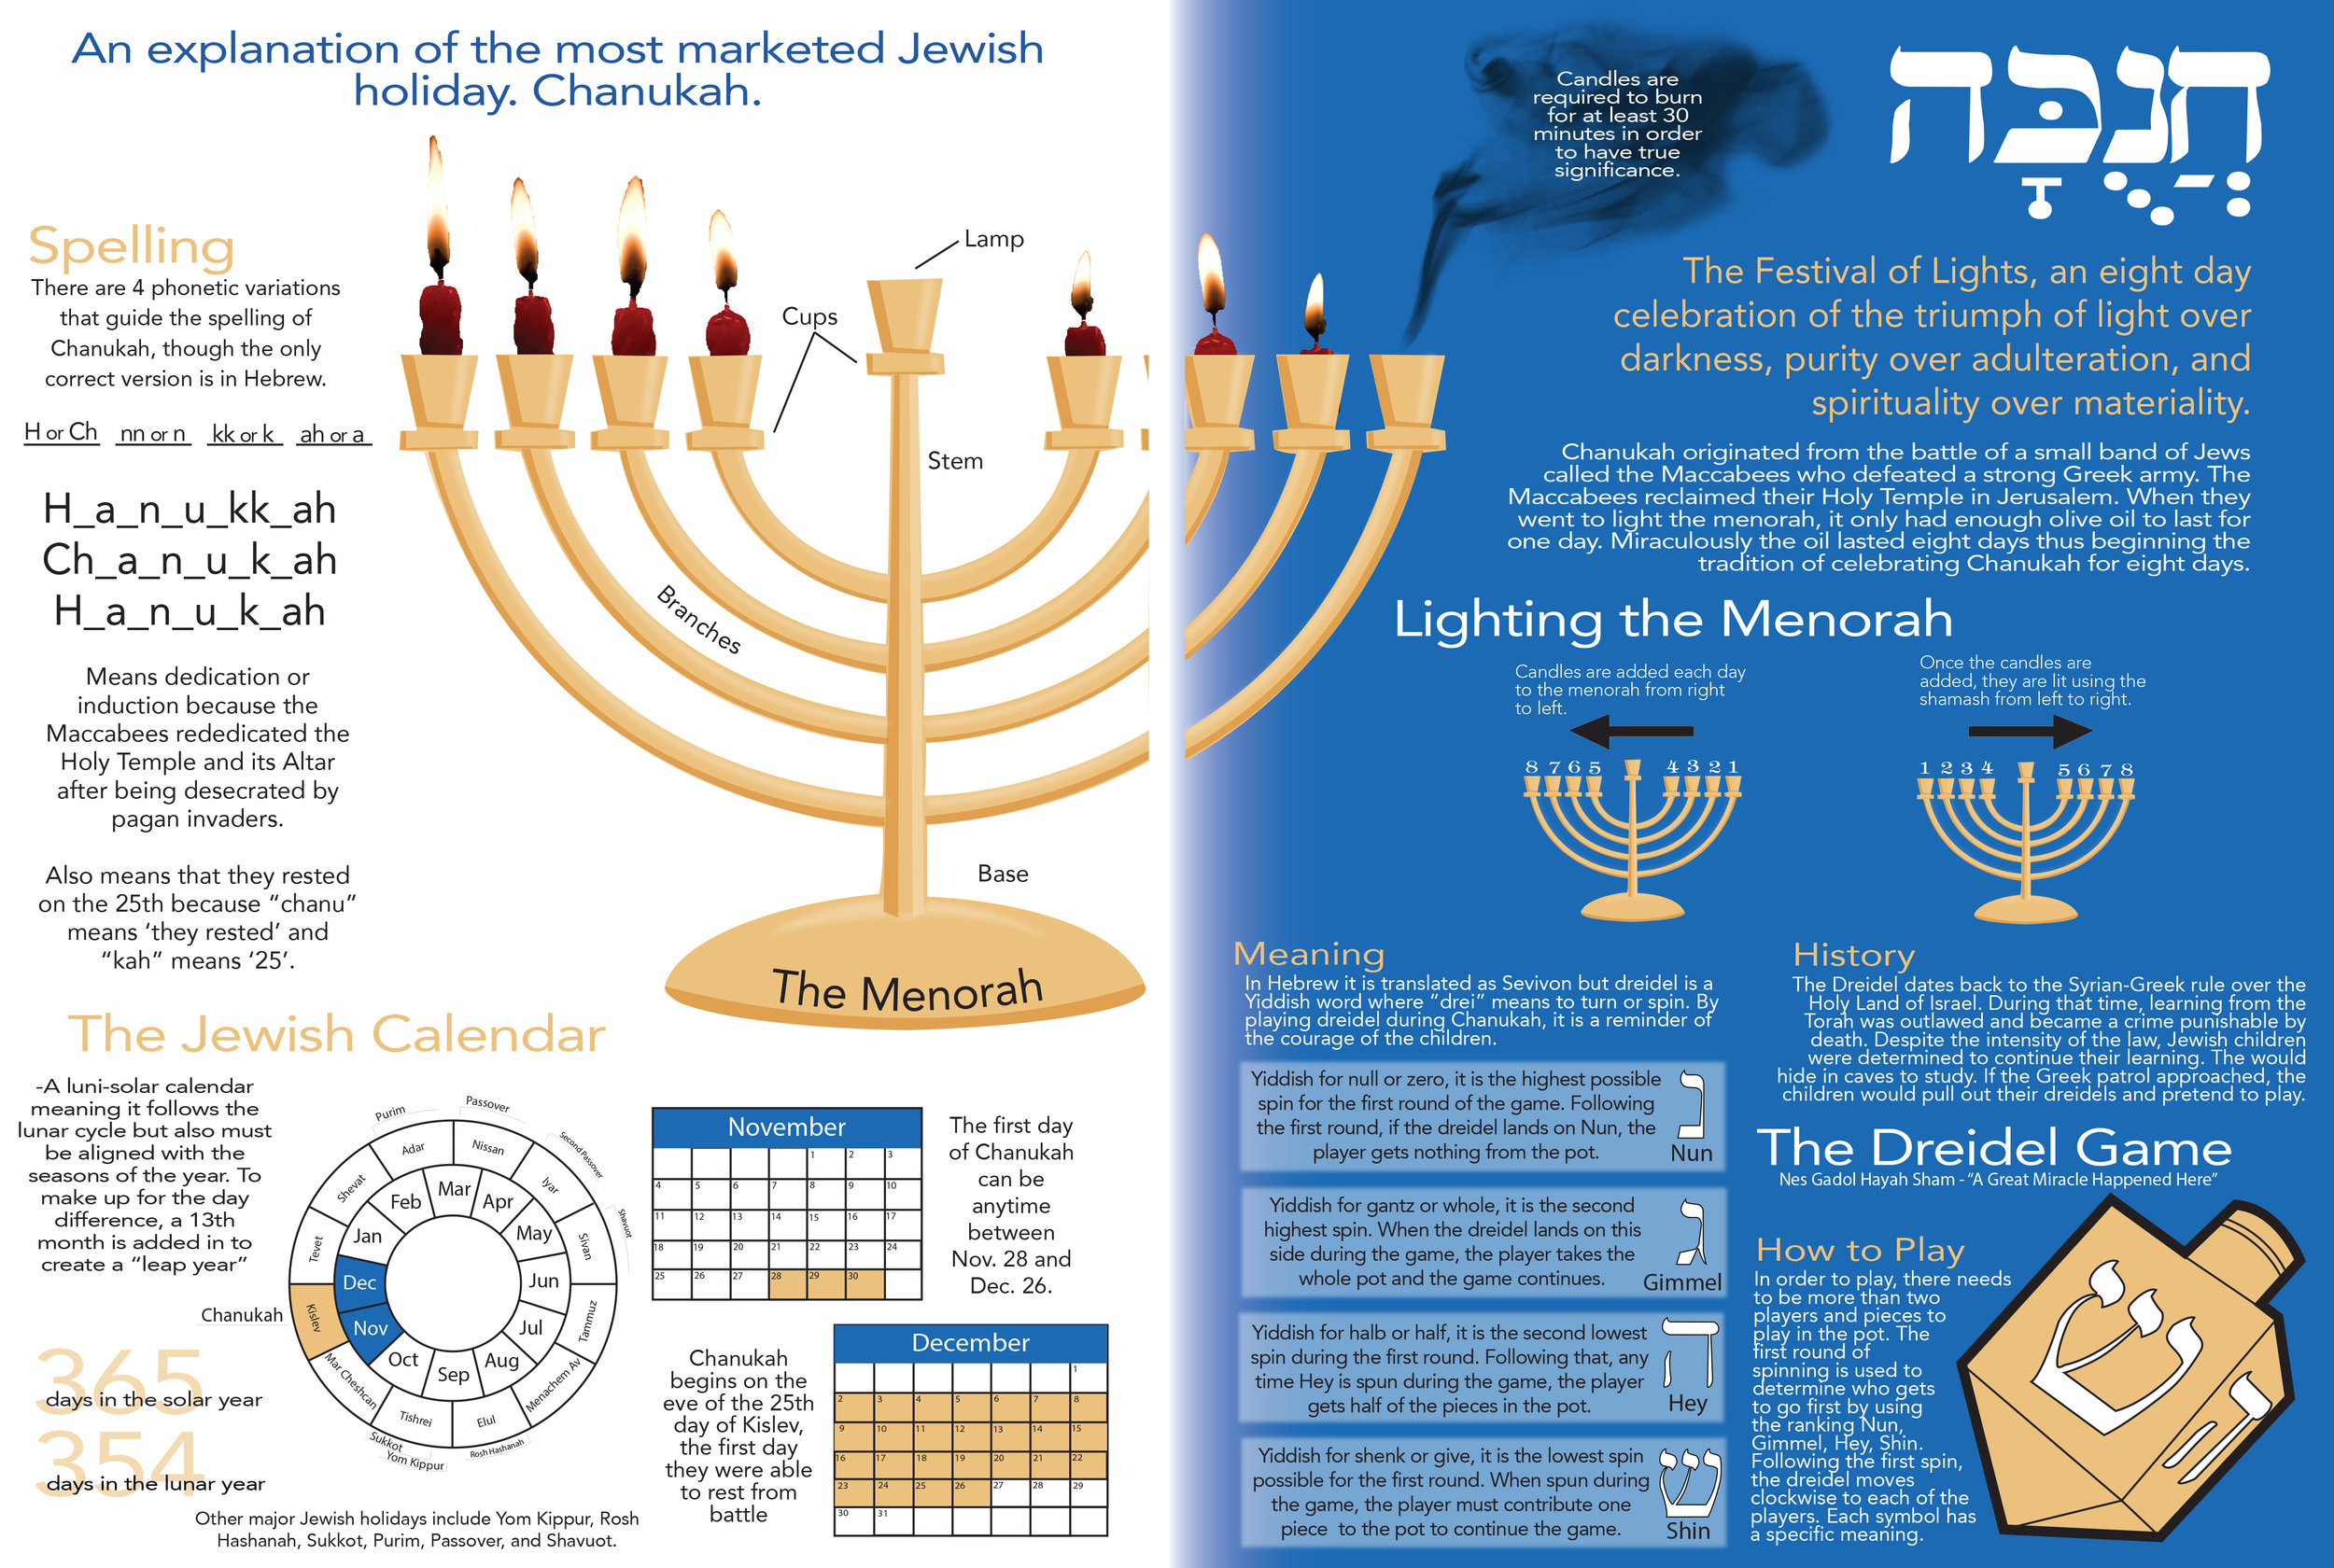 Hanukkah Infographic for a UNC Infographic Design Course